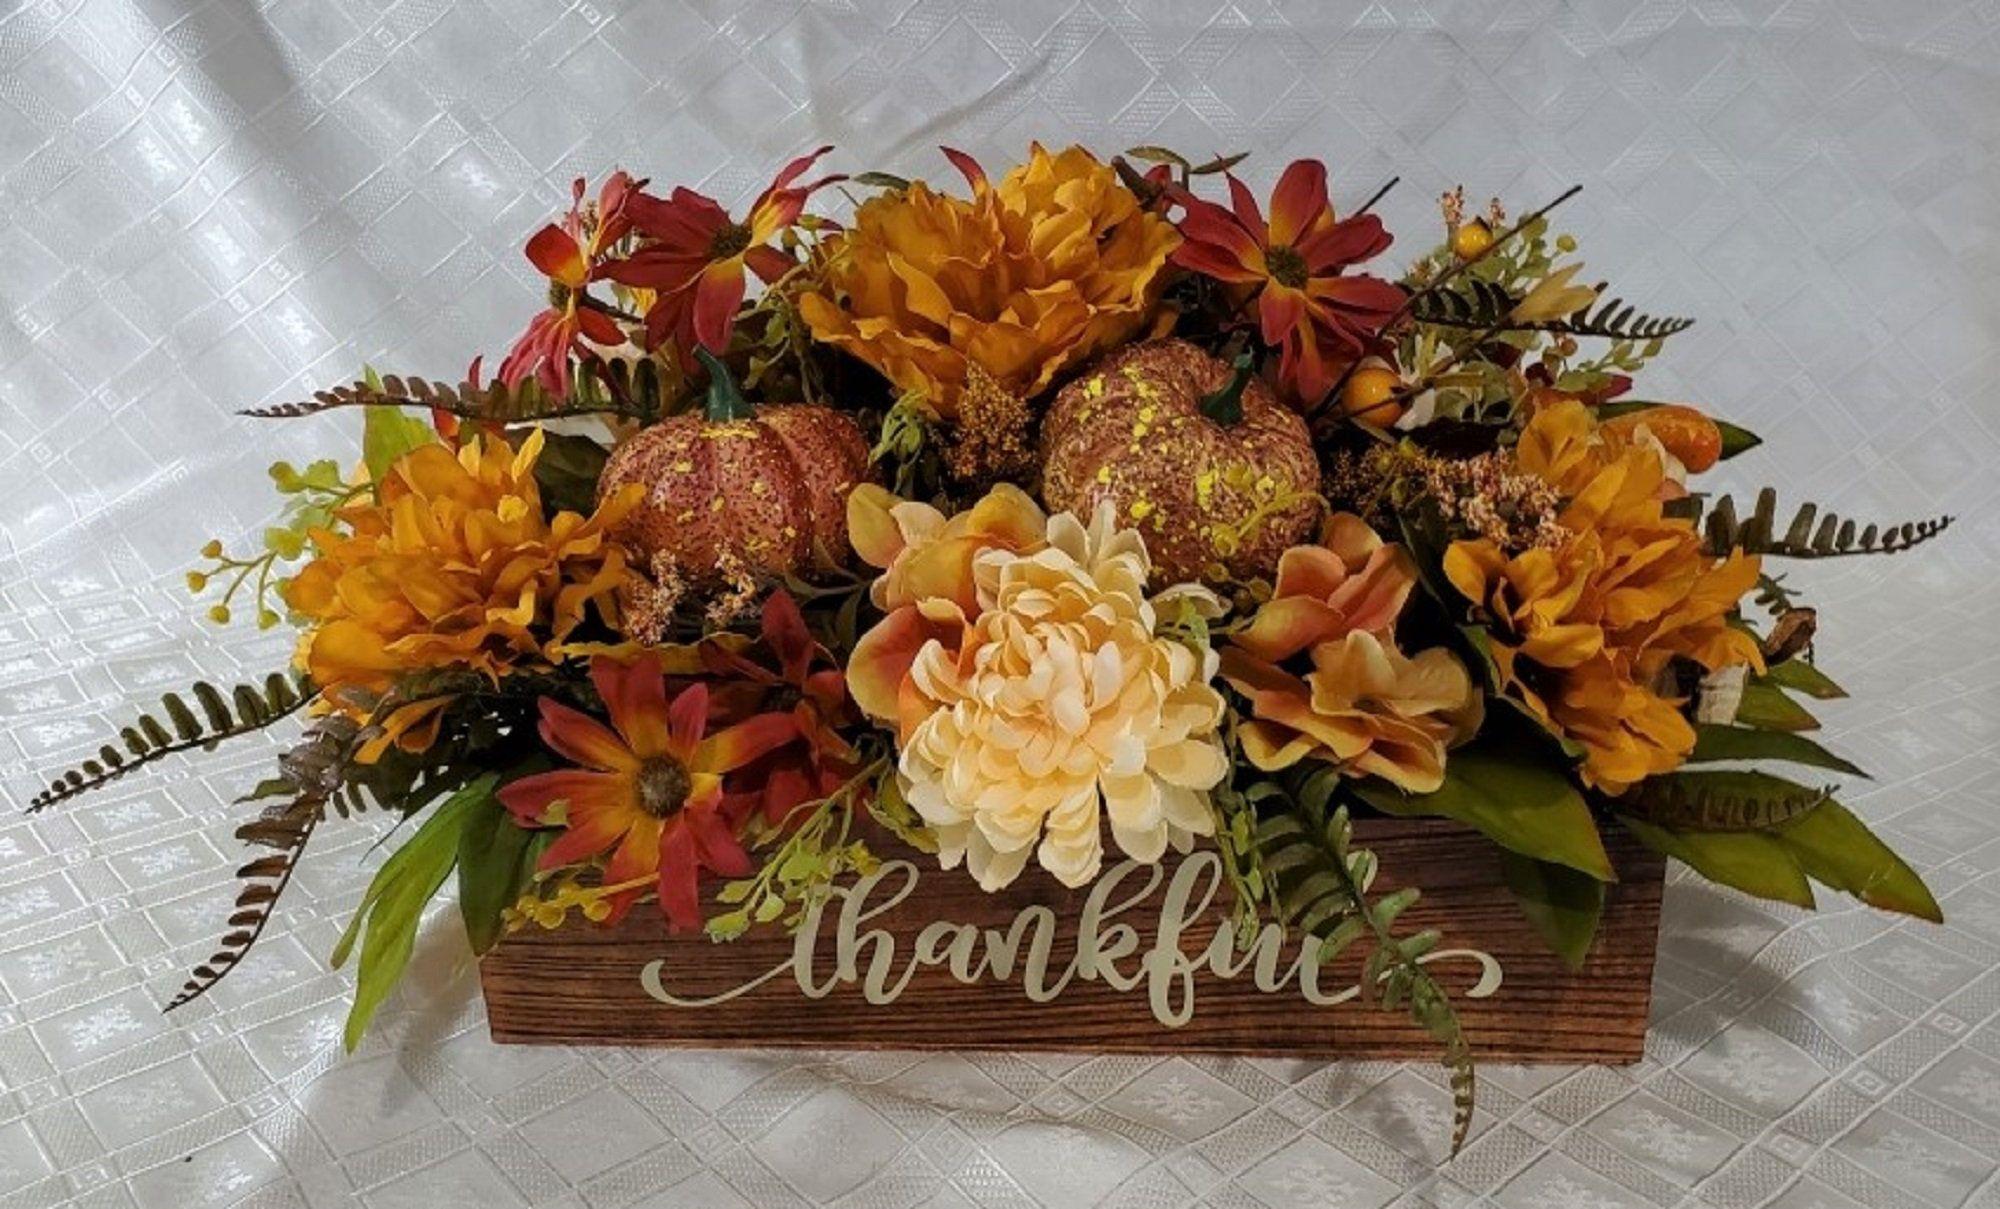 Fall Centerpiece Fall Table Decor Thanksgiving Centerpiece Etsy Fall Centerpiece Fall Table Decor Fall Table